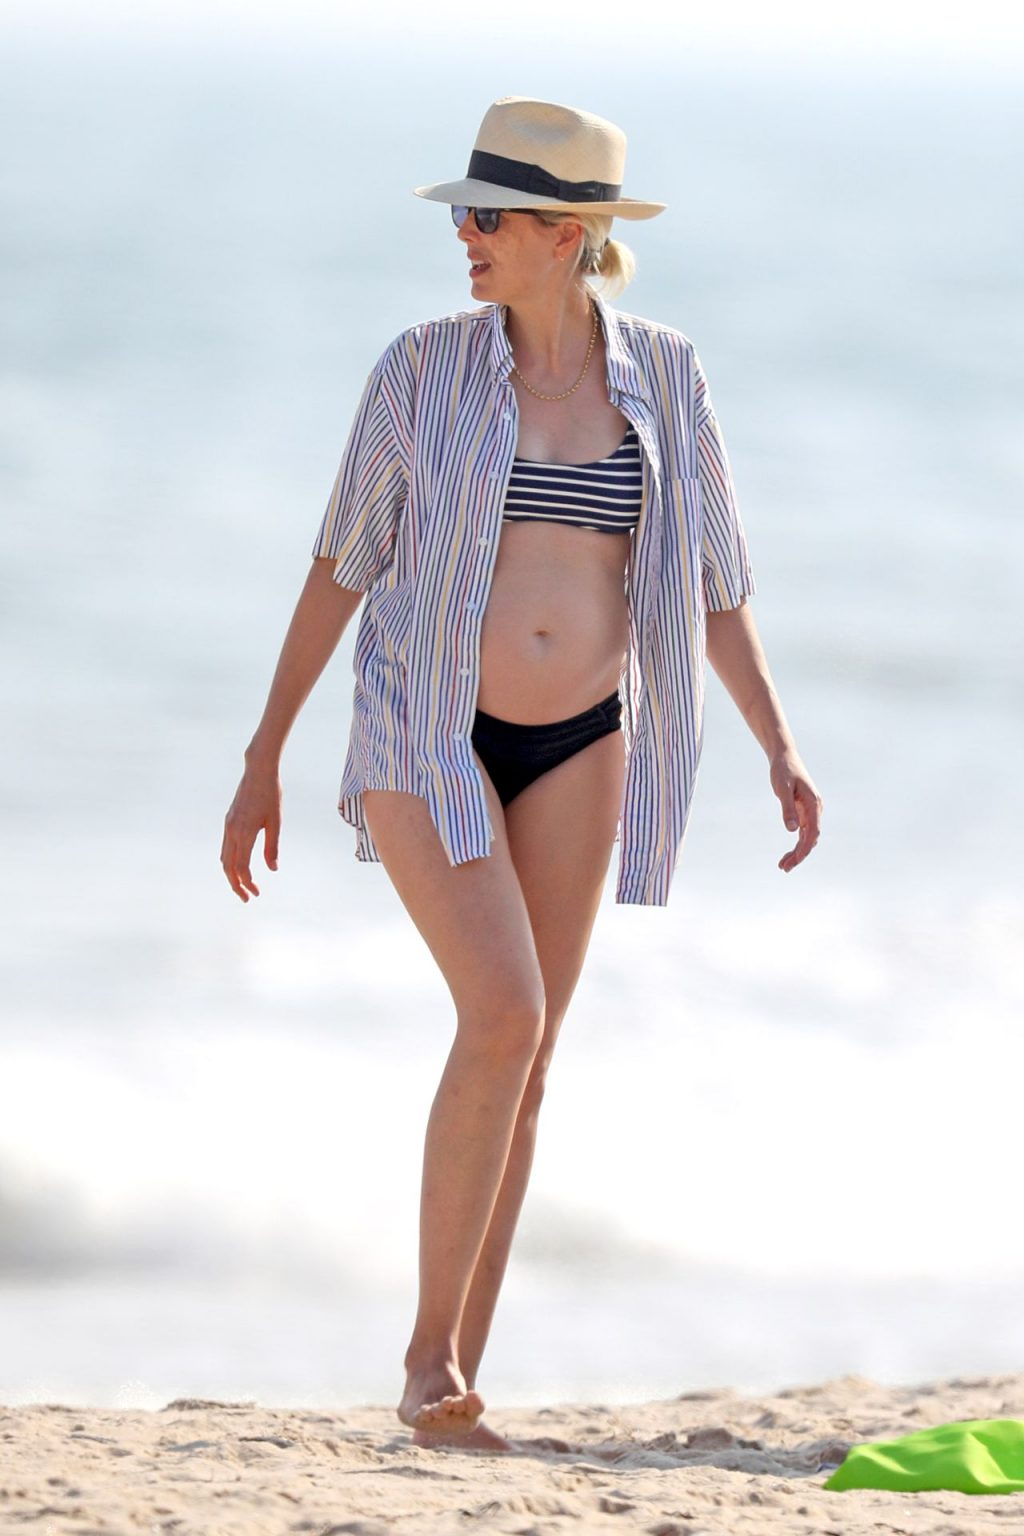 Agyness Deyn is Spotted in a Bikini on the Beach in The Hamptons (25 Photos)